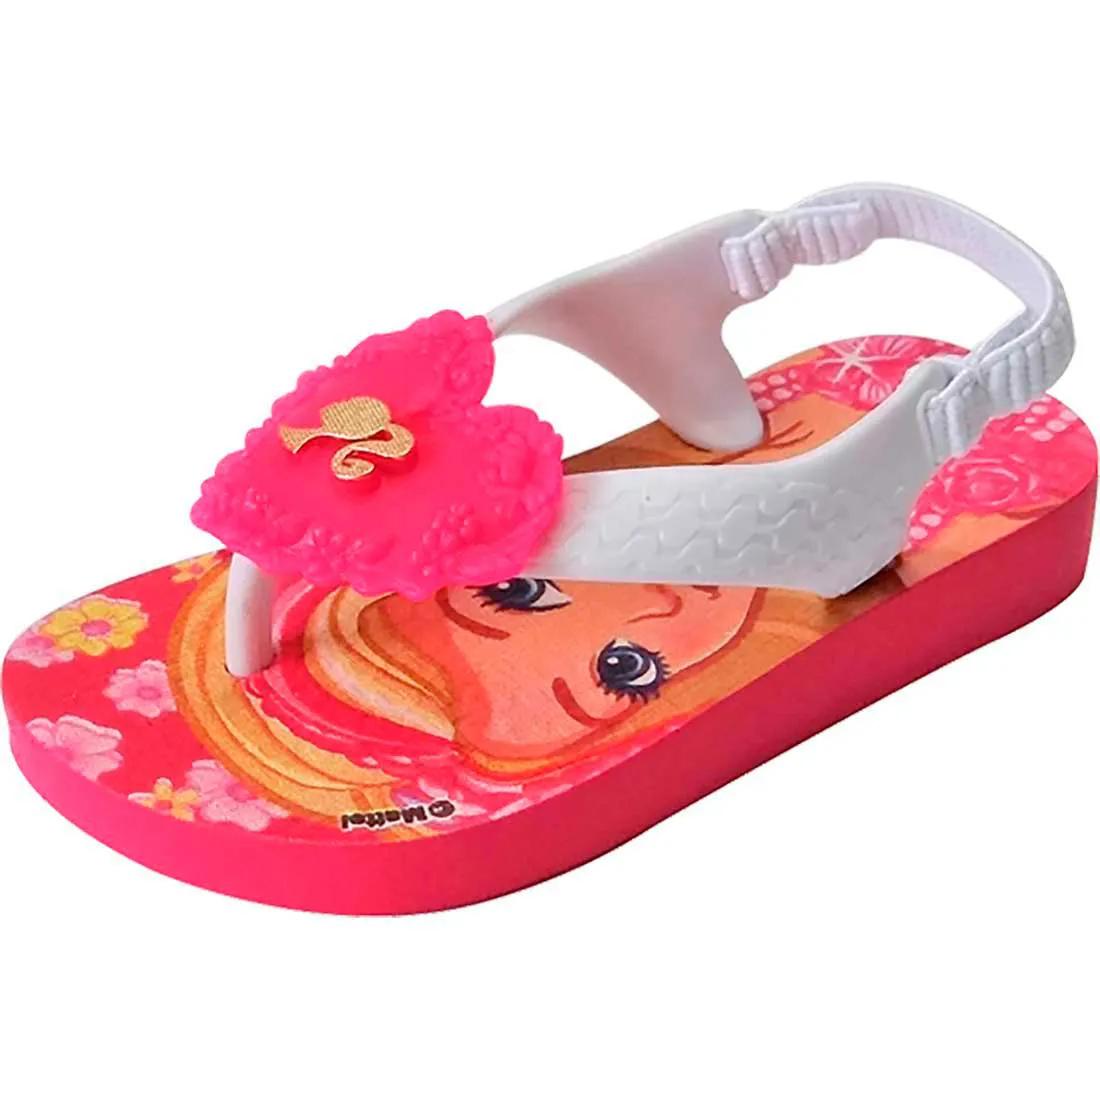 Chinelo Barbie - Rosa e Branco